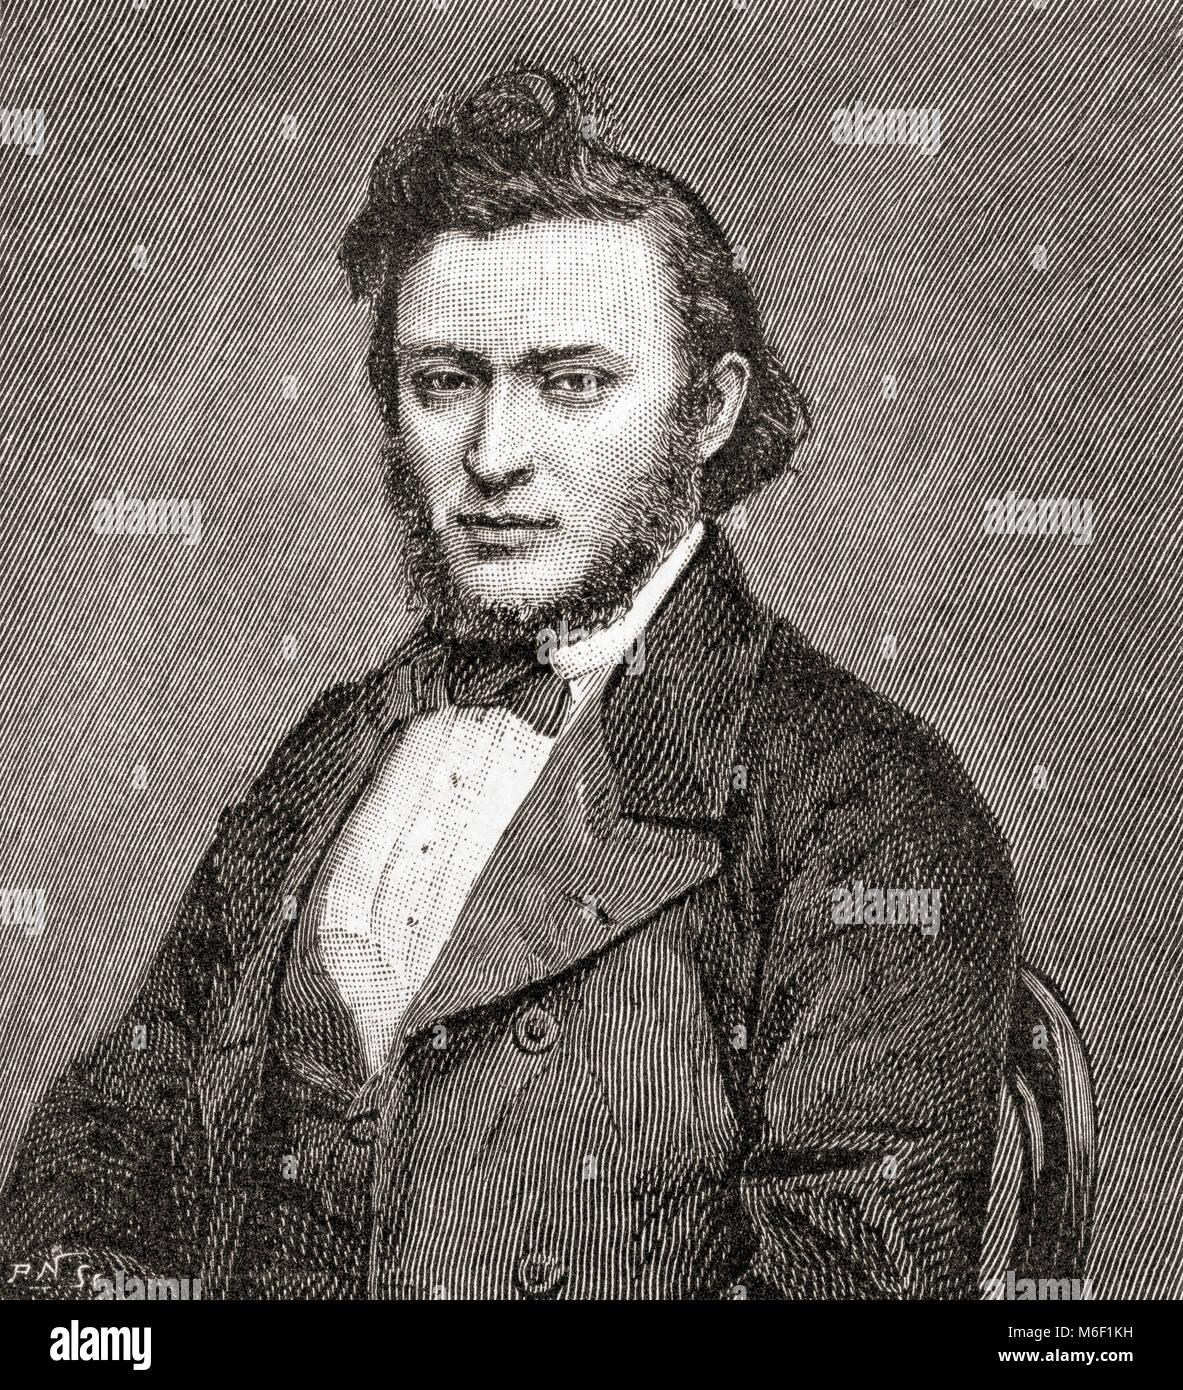 Wilhelm Gottlieb Leitner o William Gottlieb Leitner, 1840 - 1899. El orientalista británico. A partir de The Imagen De Stock